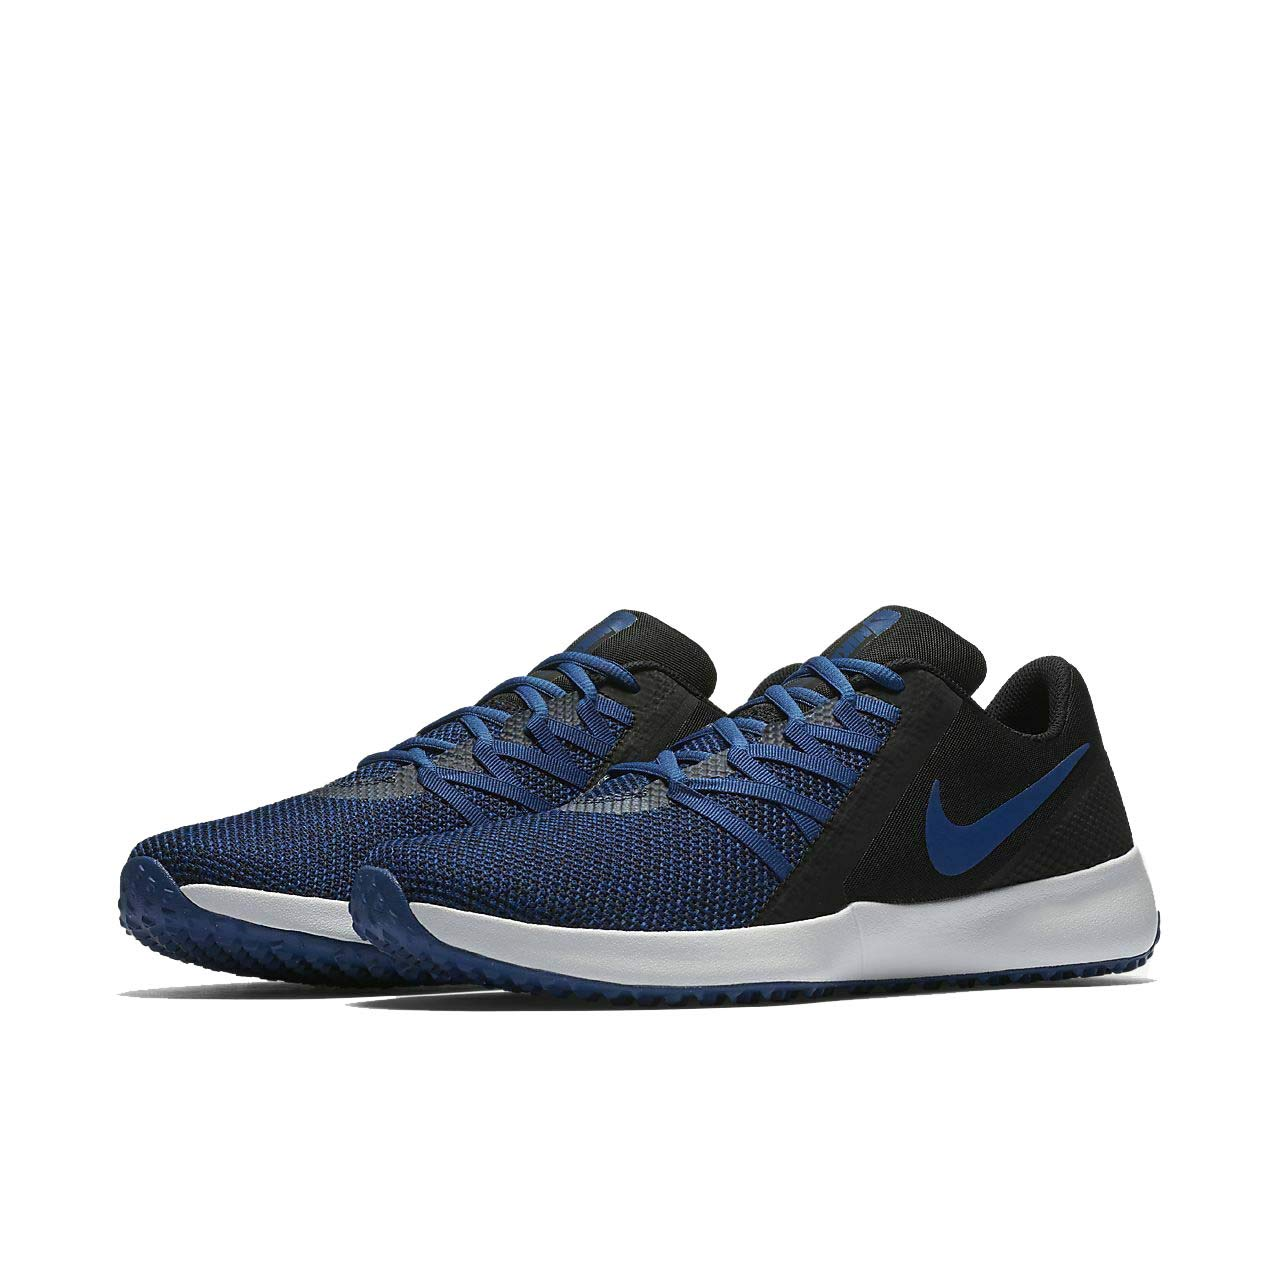 Nike Mens Varsity Compete Trainer Men's